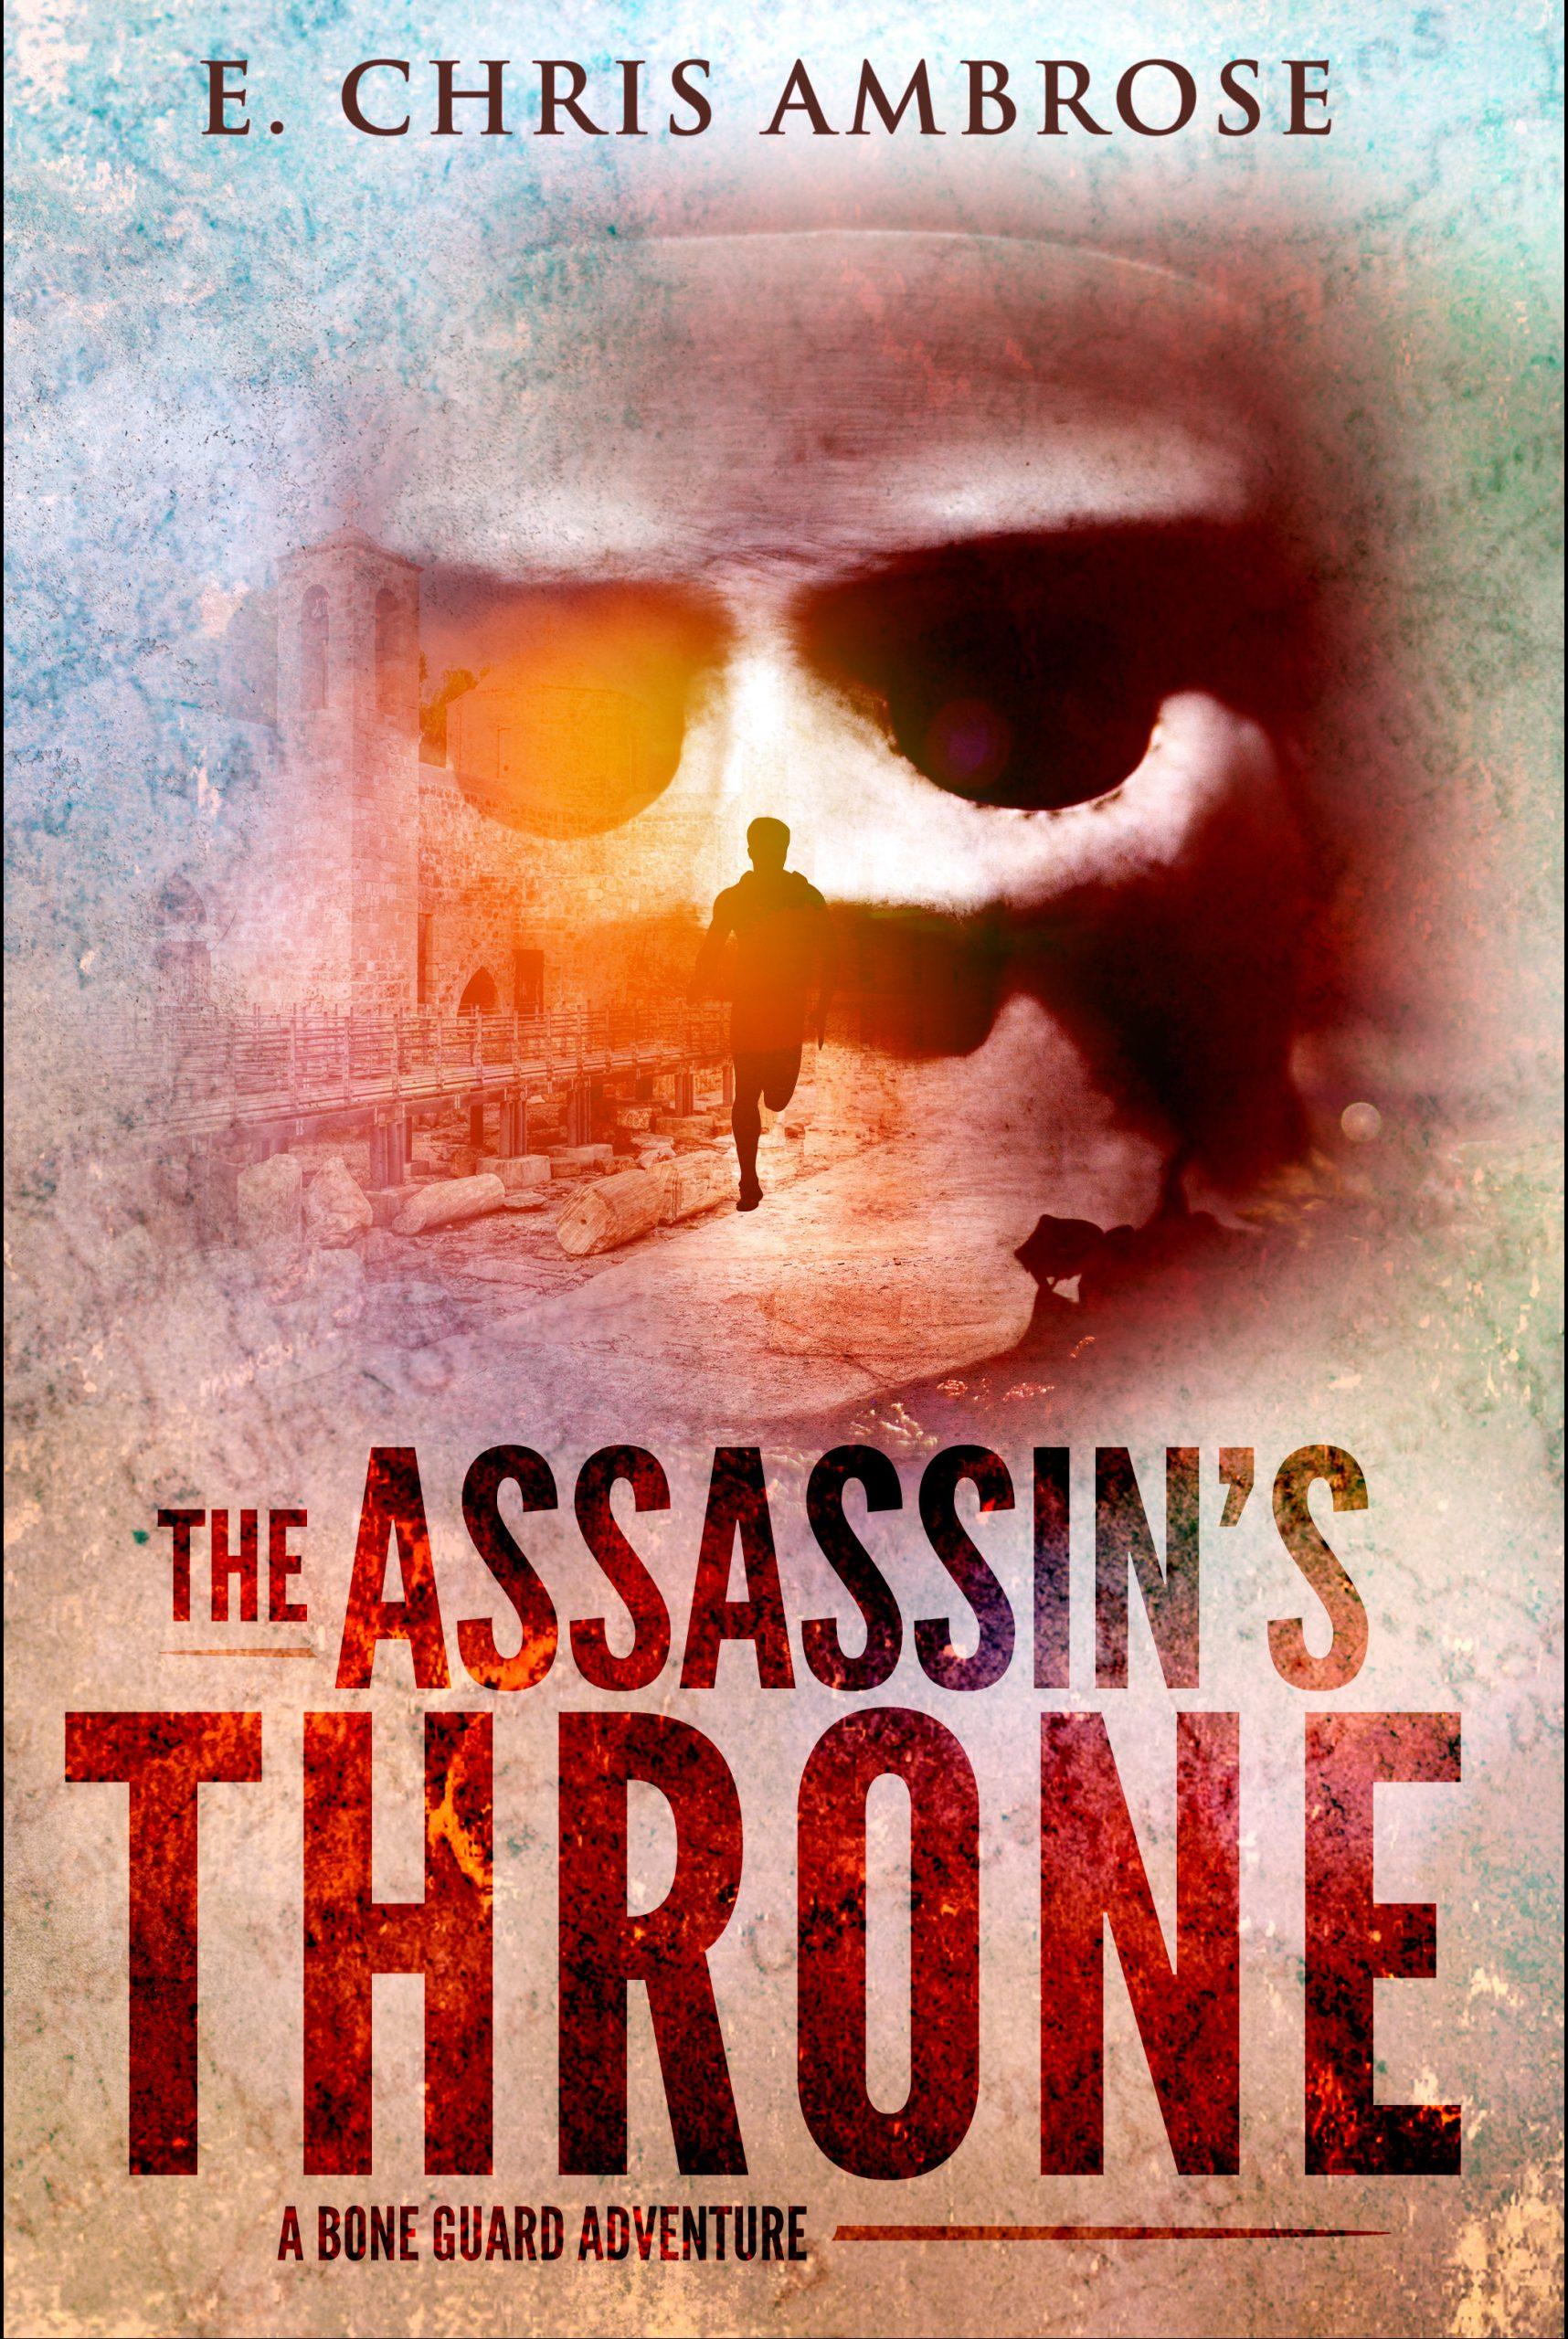 Bone Guard Series Mystery & Thriller